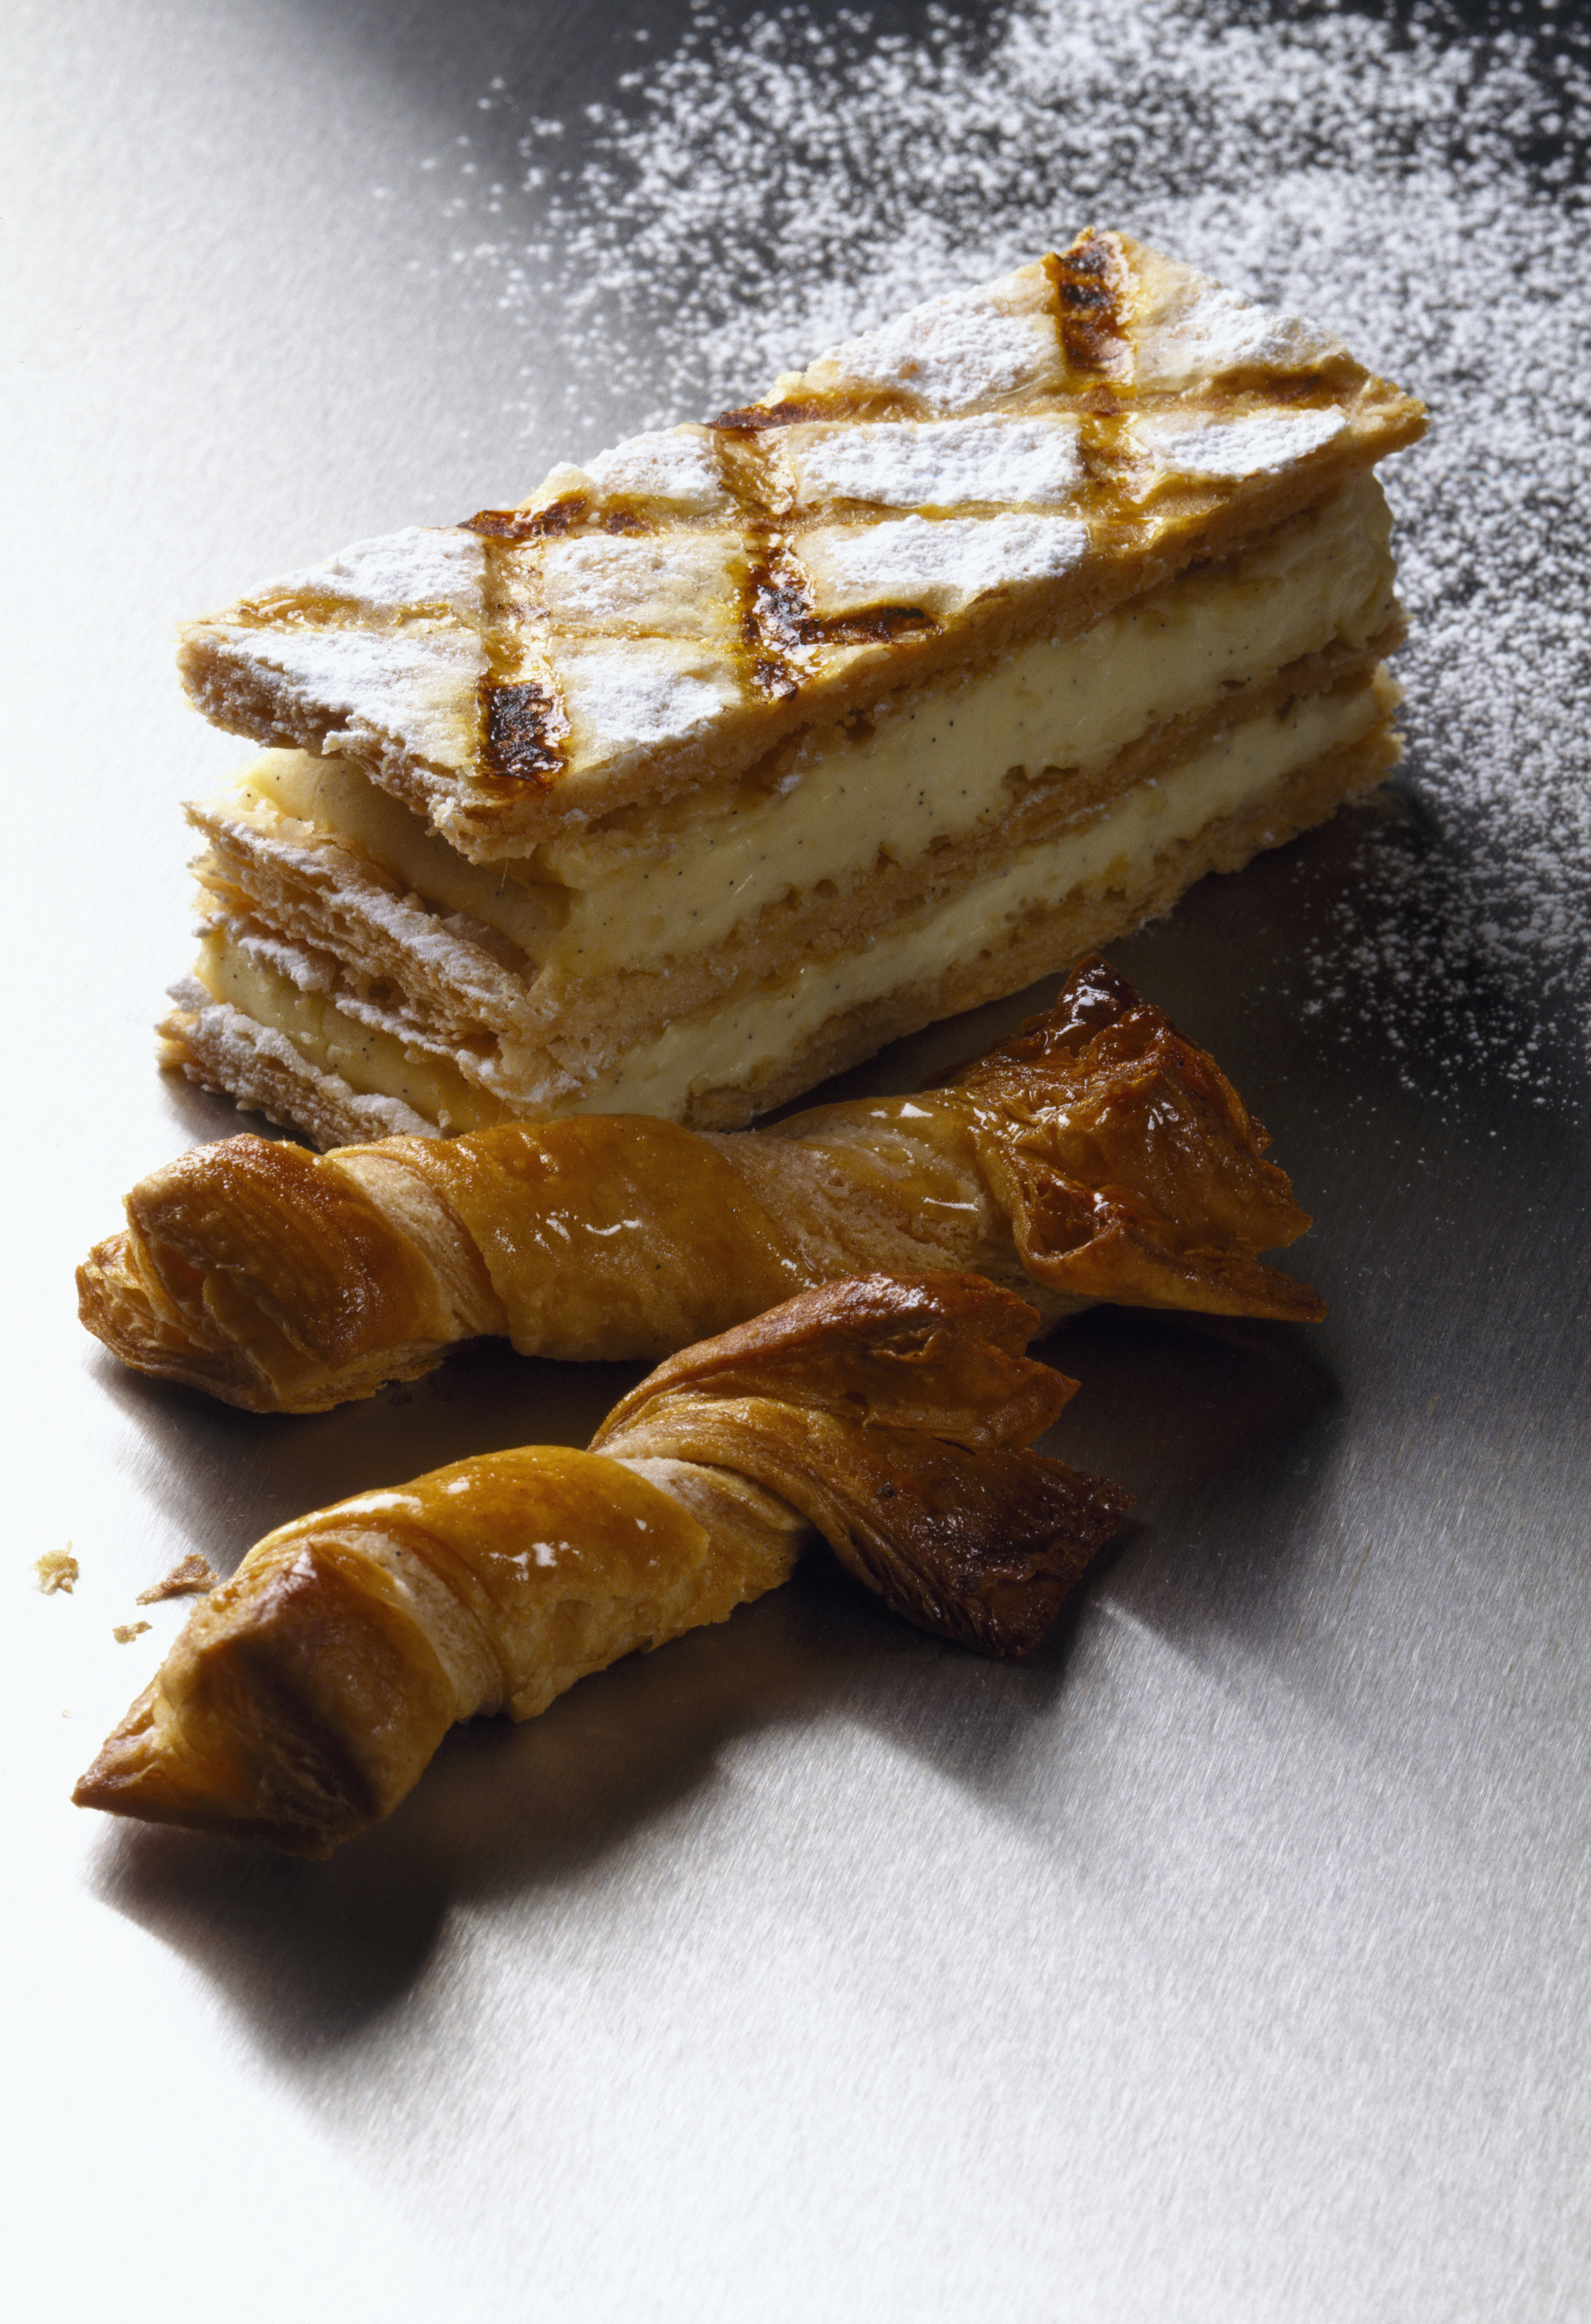 Curso de t cnicas express de cocina 2 escuela de cocina for Tecnicas basicas de cocina pdf